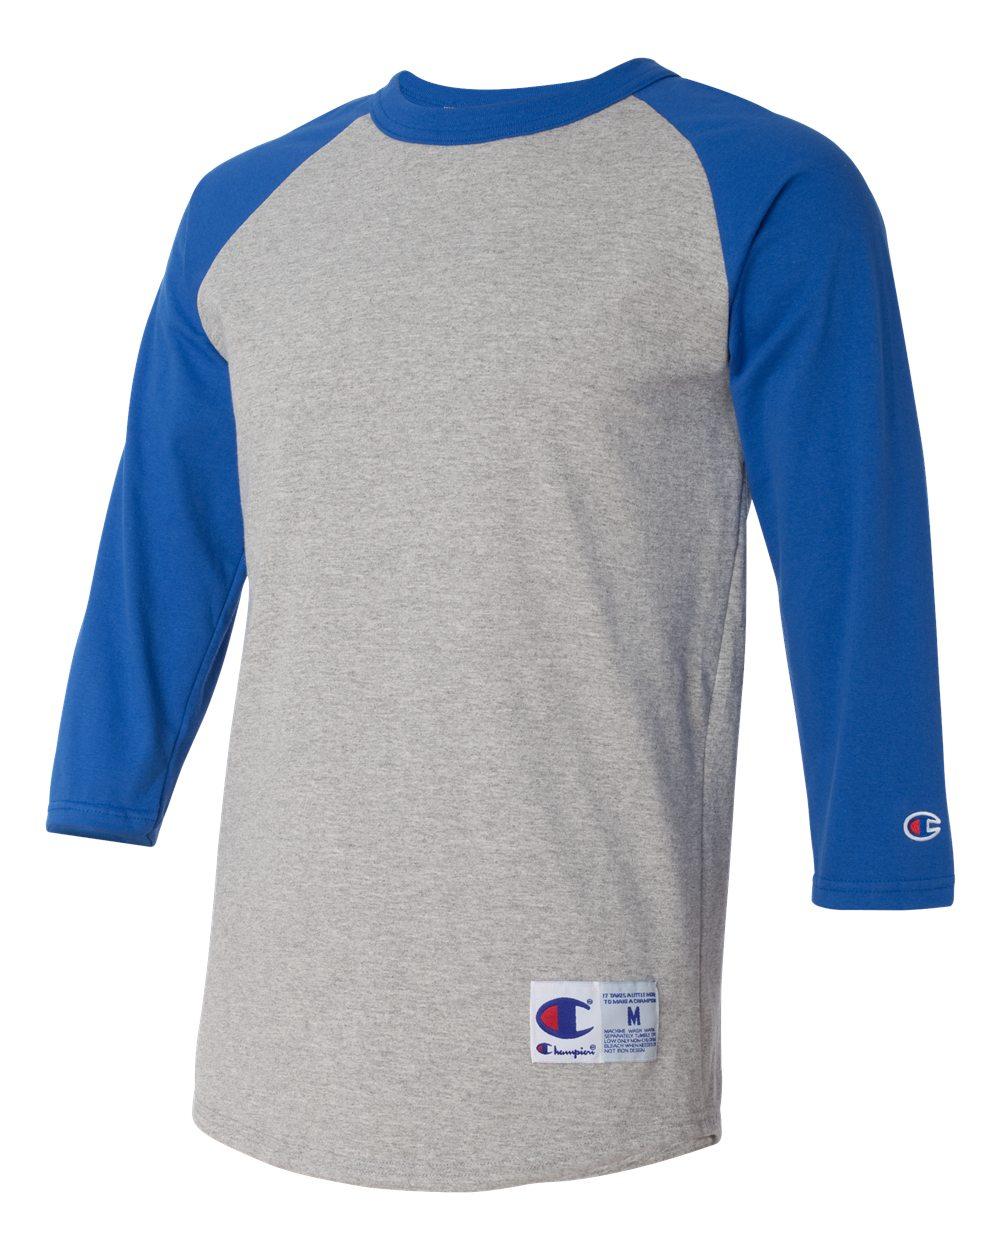 Champion Men s 5.2 oz. Raglan Baseball T-Shirt T1397 S-3XL  7134f7faf